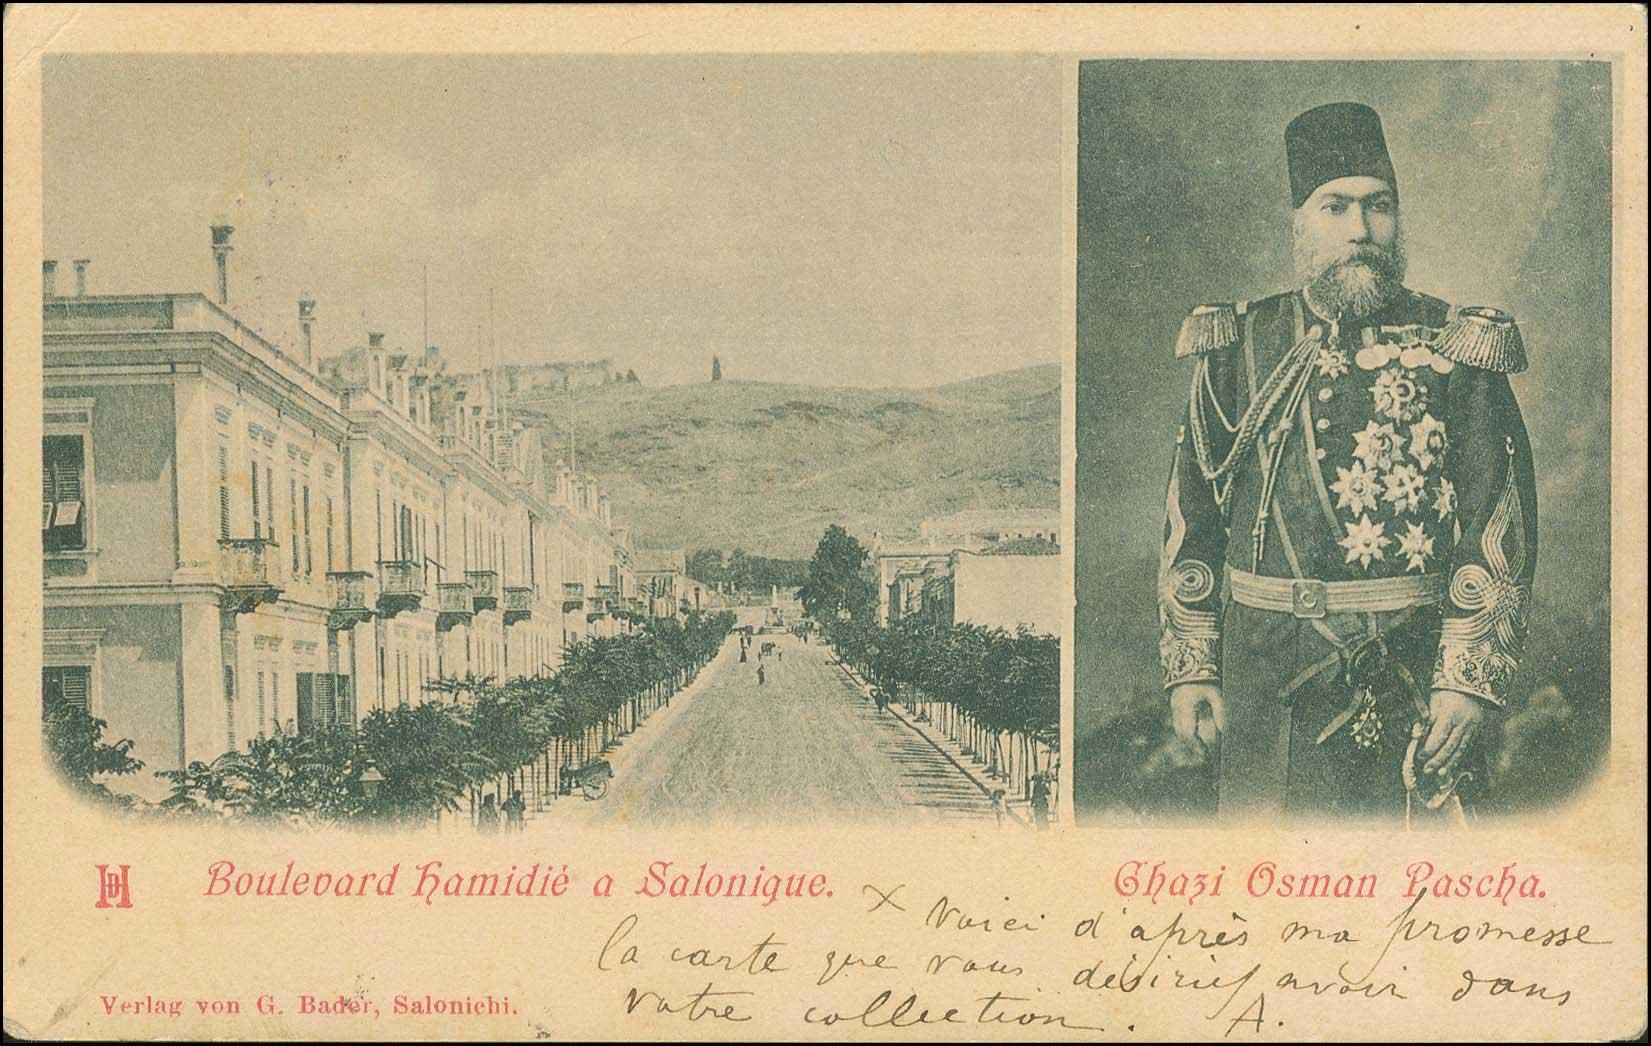 Lot 854 - -  THESSALONIKI (SALONICA) Thessaloniki (Salonica) -  A. Karamitsos Public Auction 639 General Stamp Sale